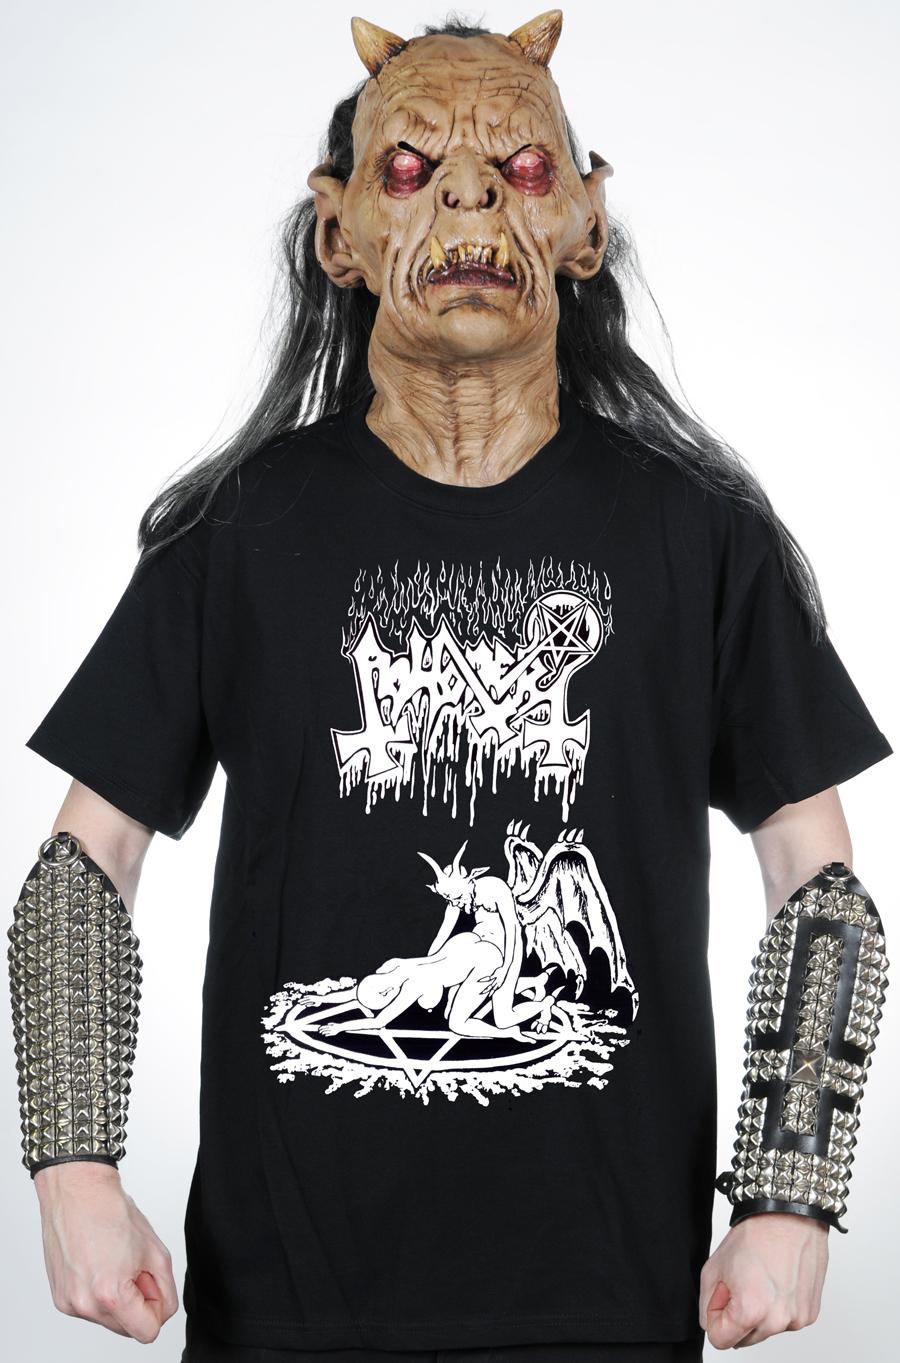 Heavy Black Death Thrash Metal Band Shirts Clothing Hells Abhorer